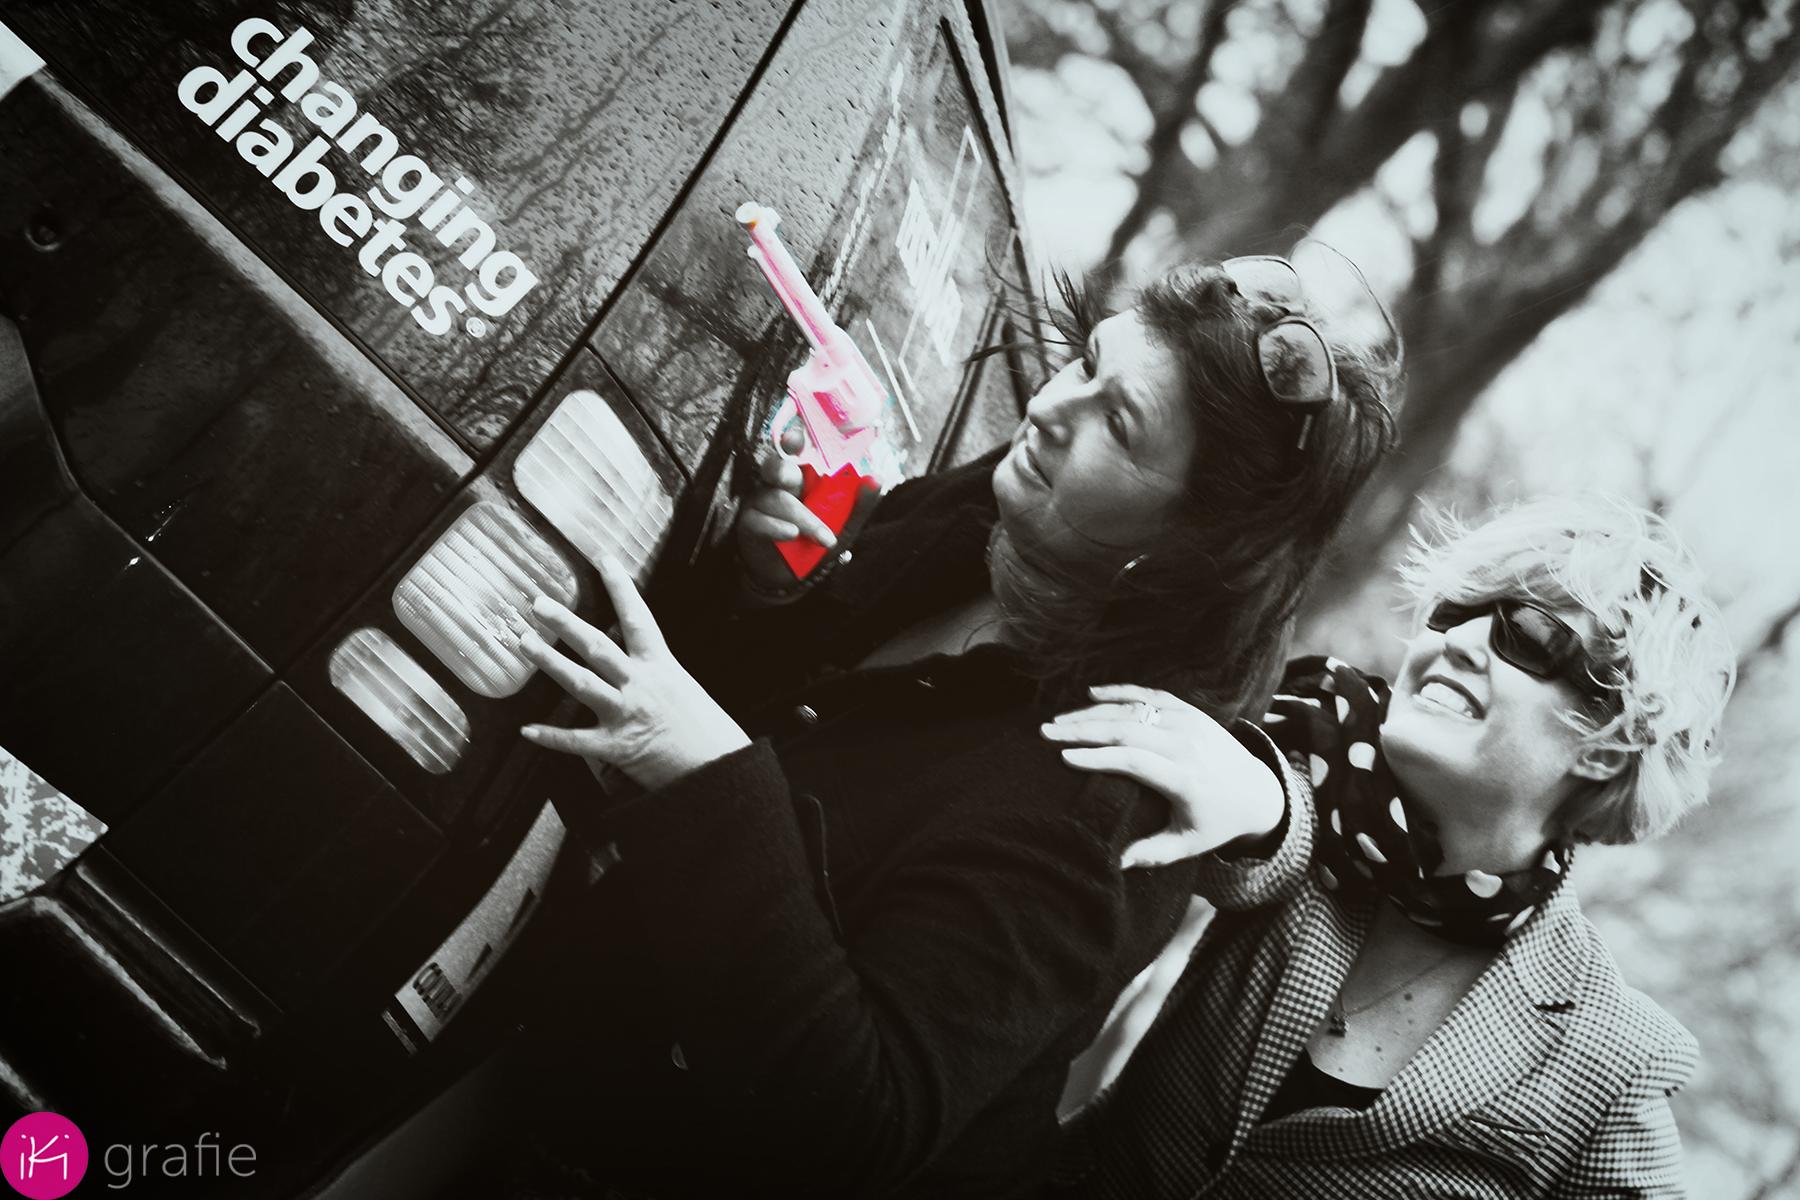 vergeet Bonnie&Clyde